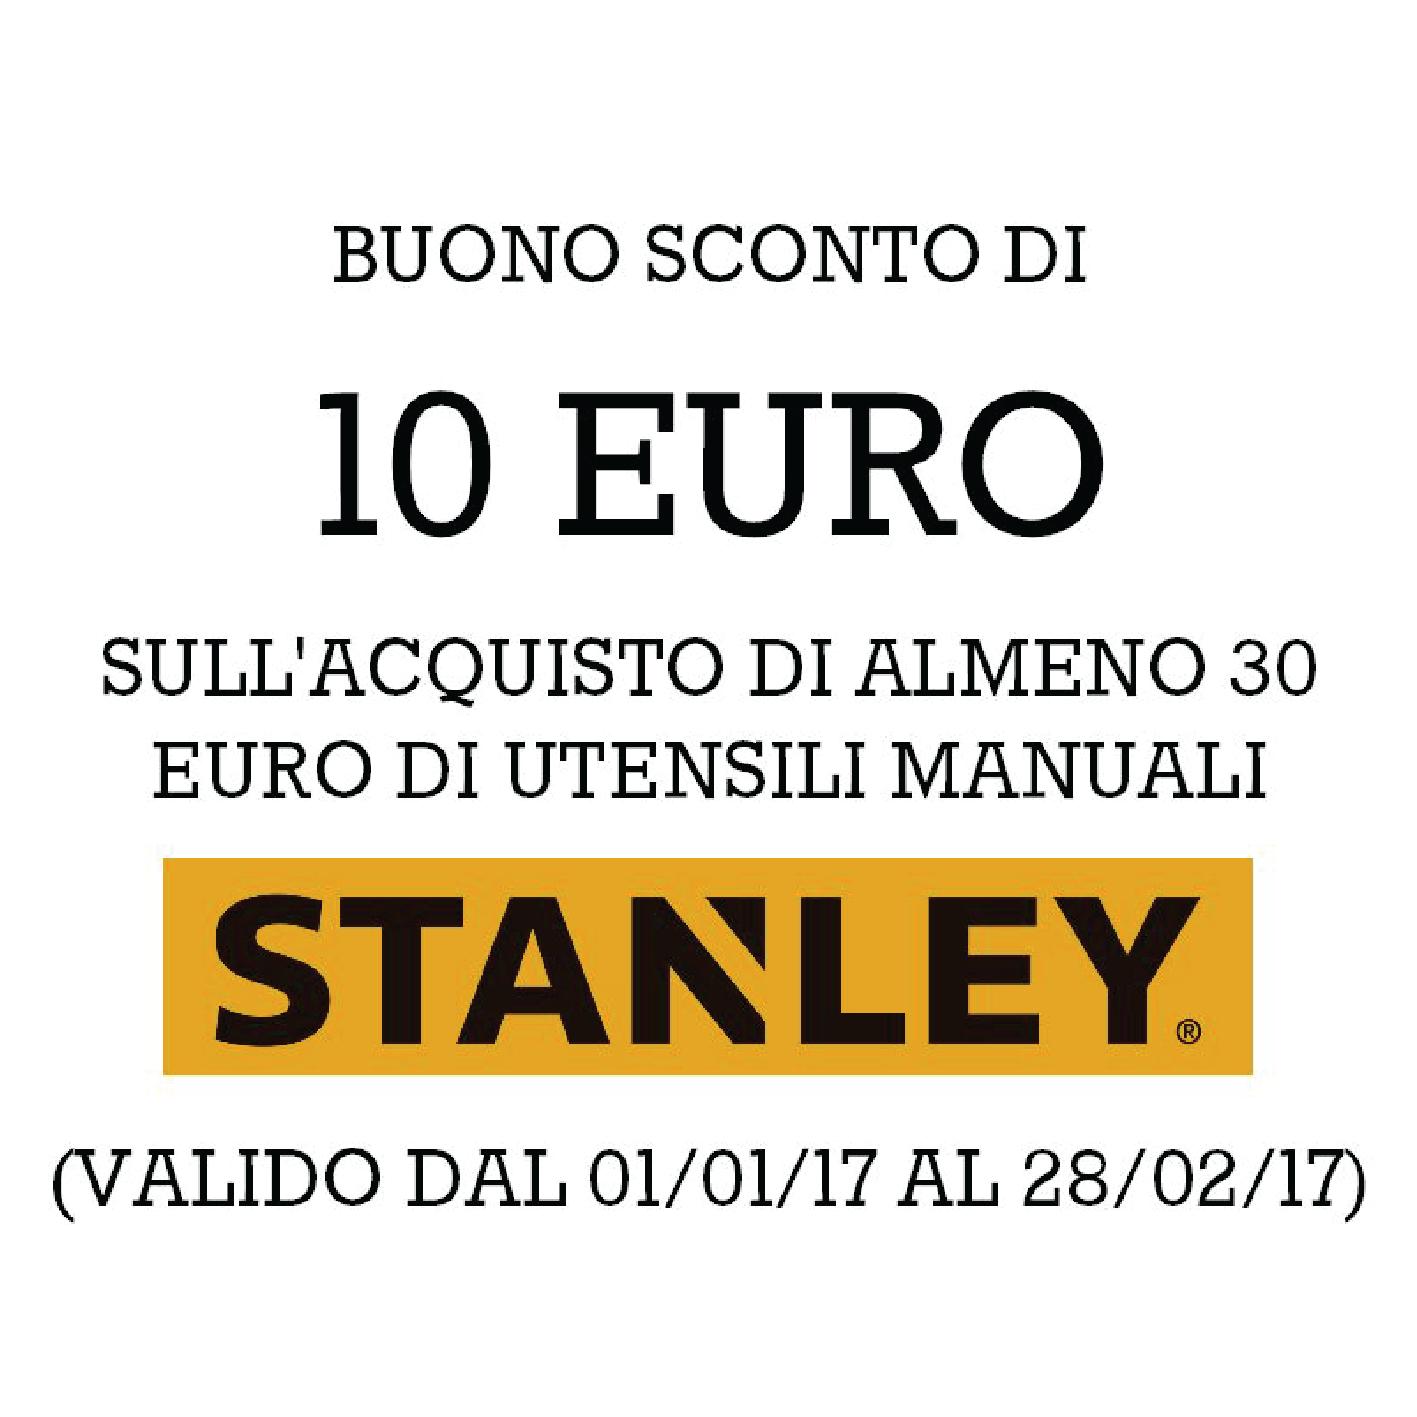 Buono sconto Stanley